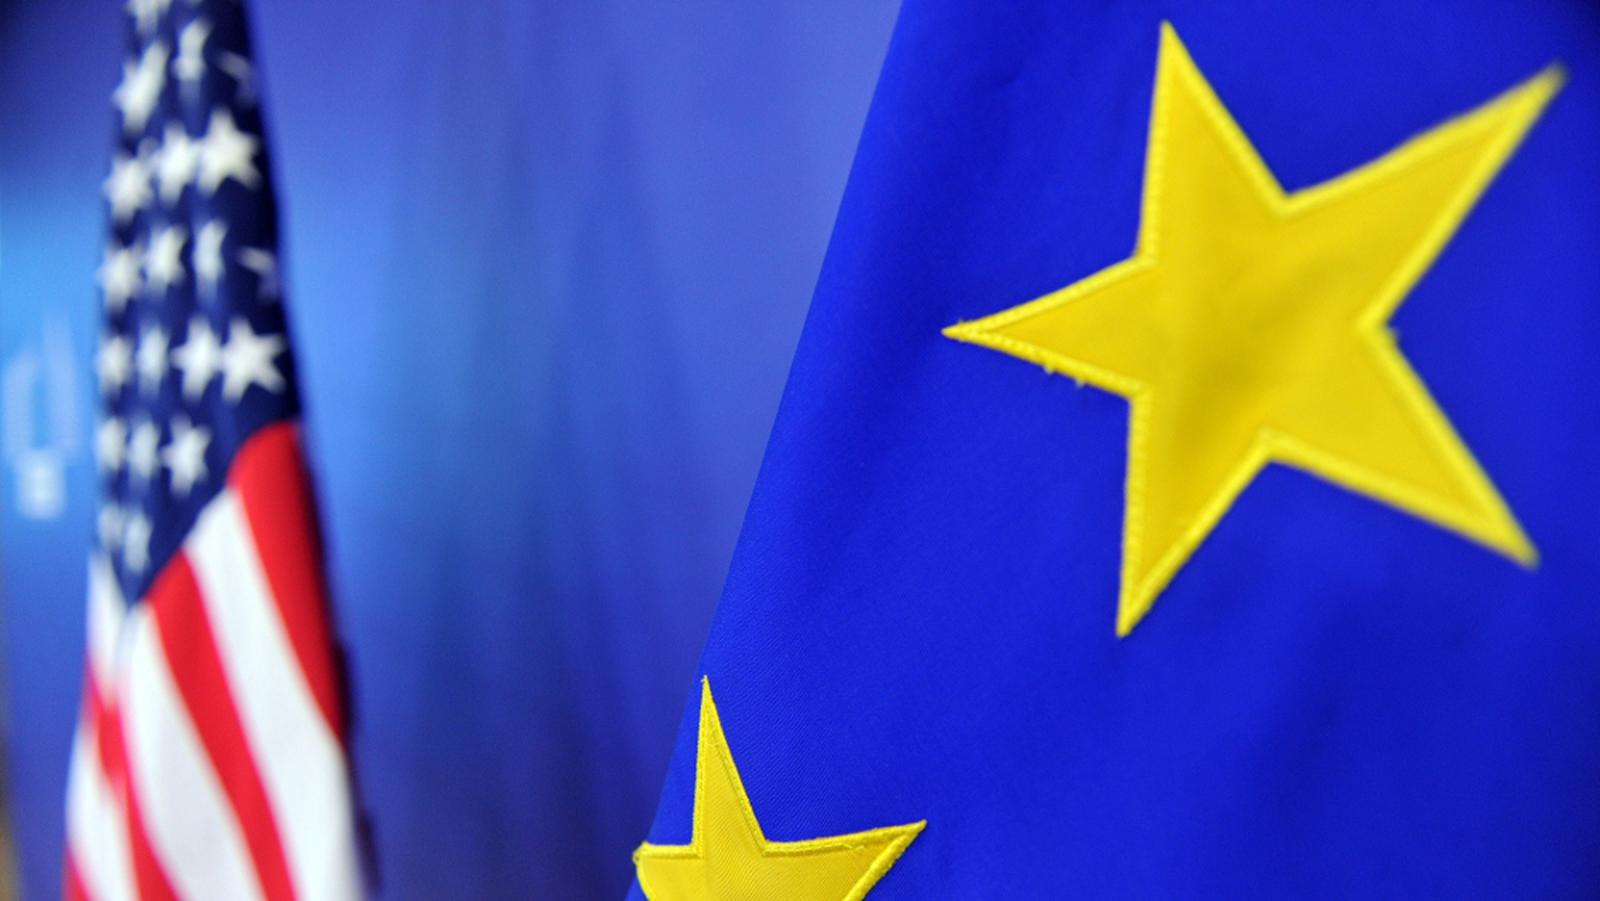 Ireland 'strategic beachhead' to EU for US firms